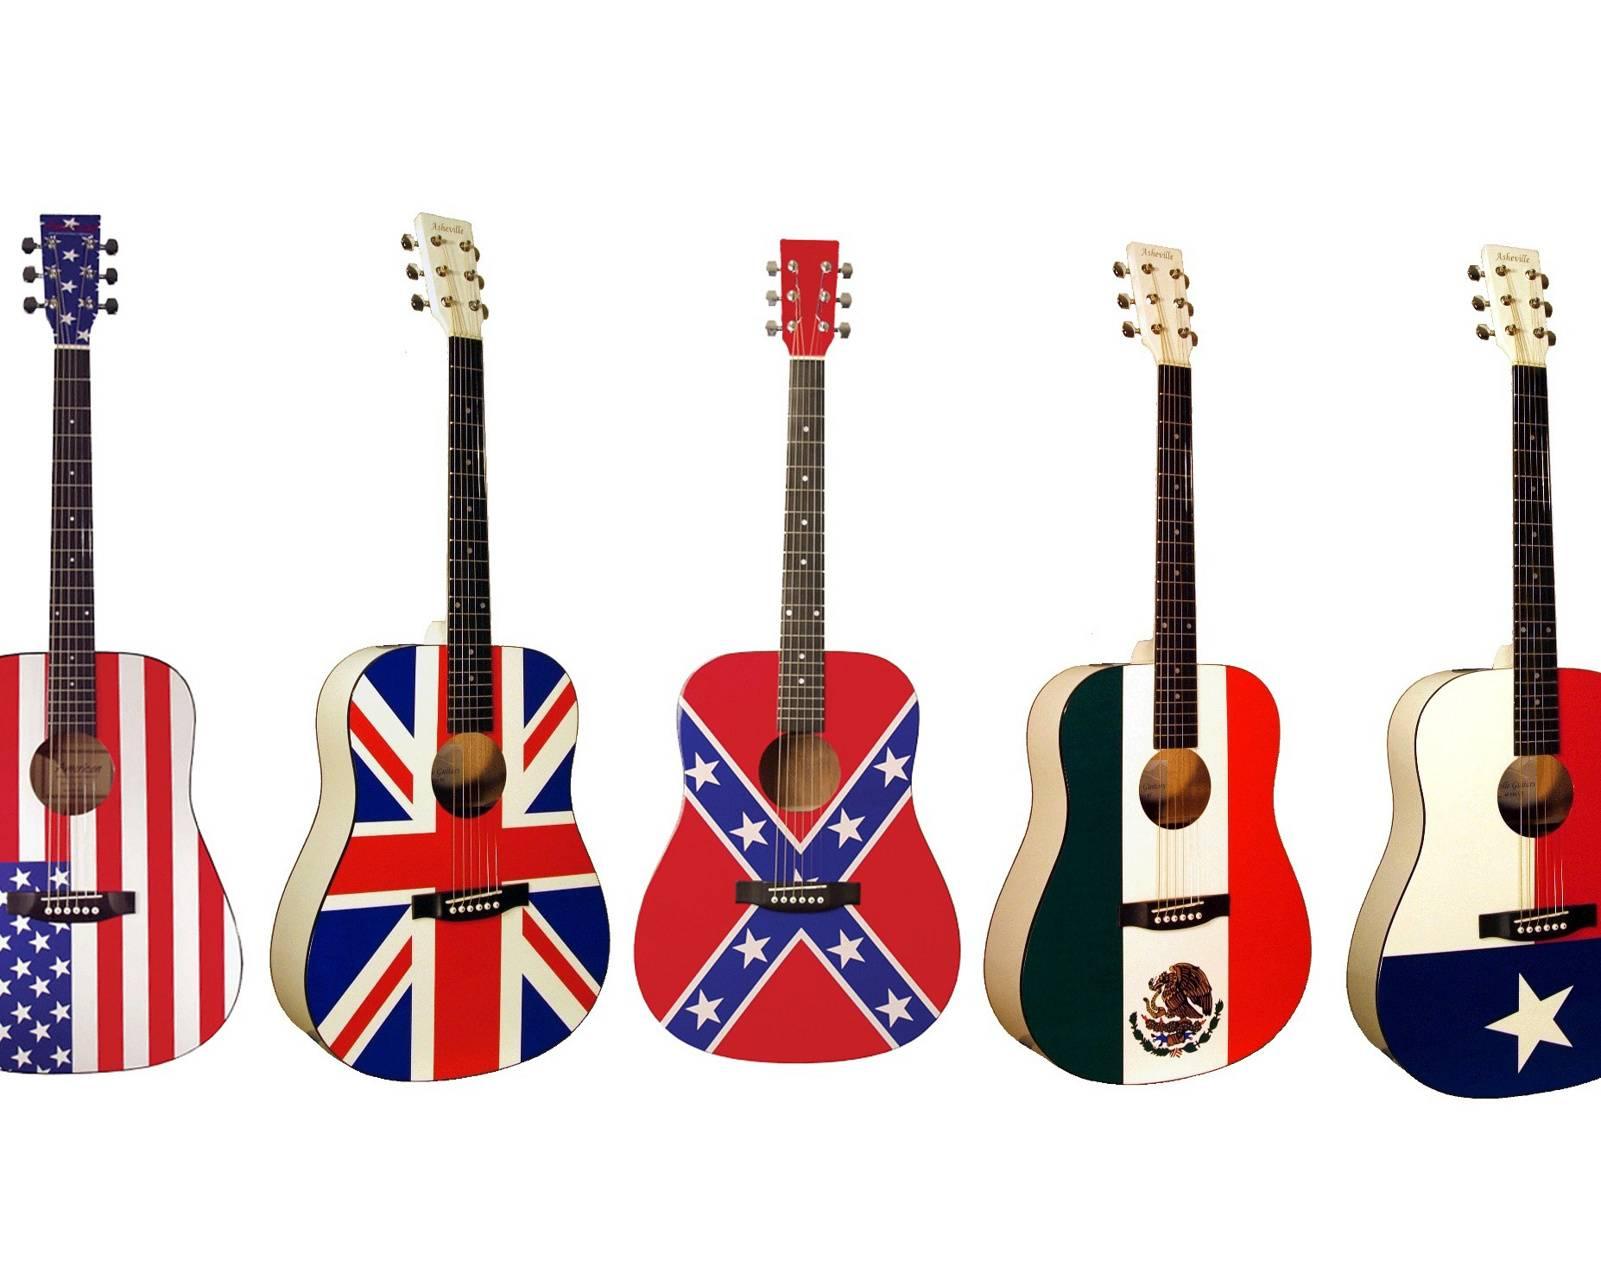 Guitar Flags